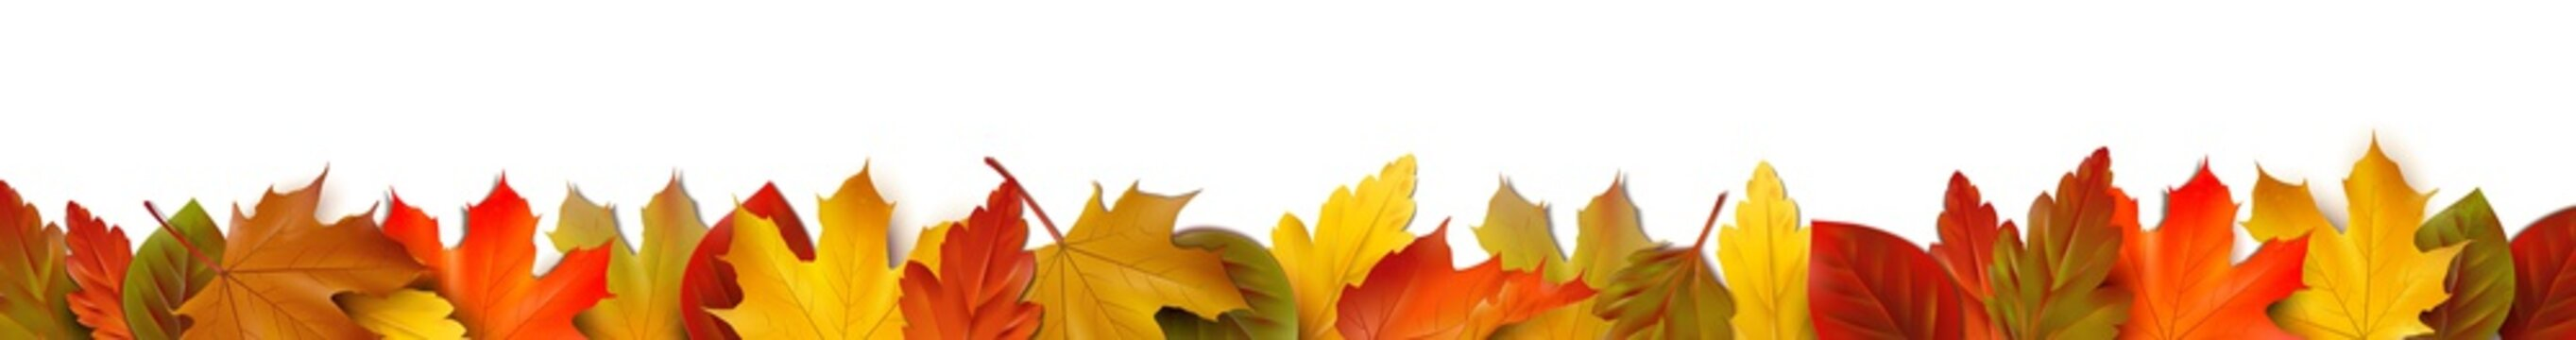 Bunte Herbstblätter - Bordüre Banner